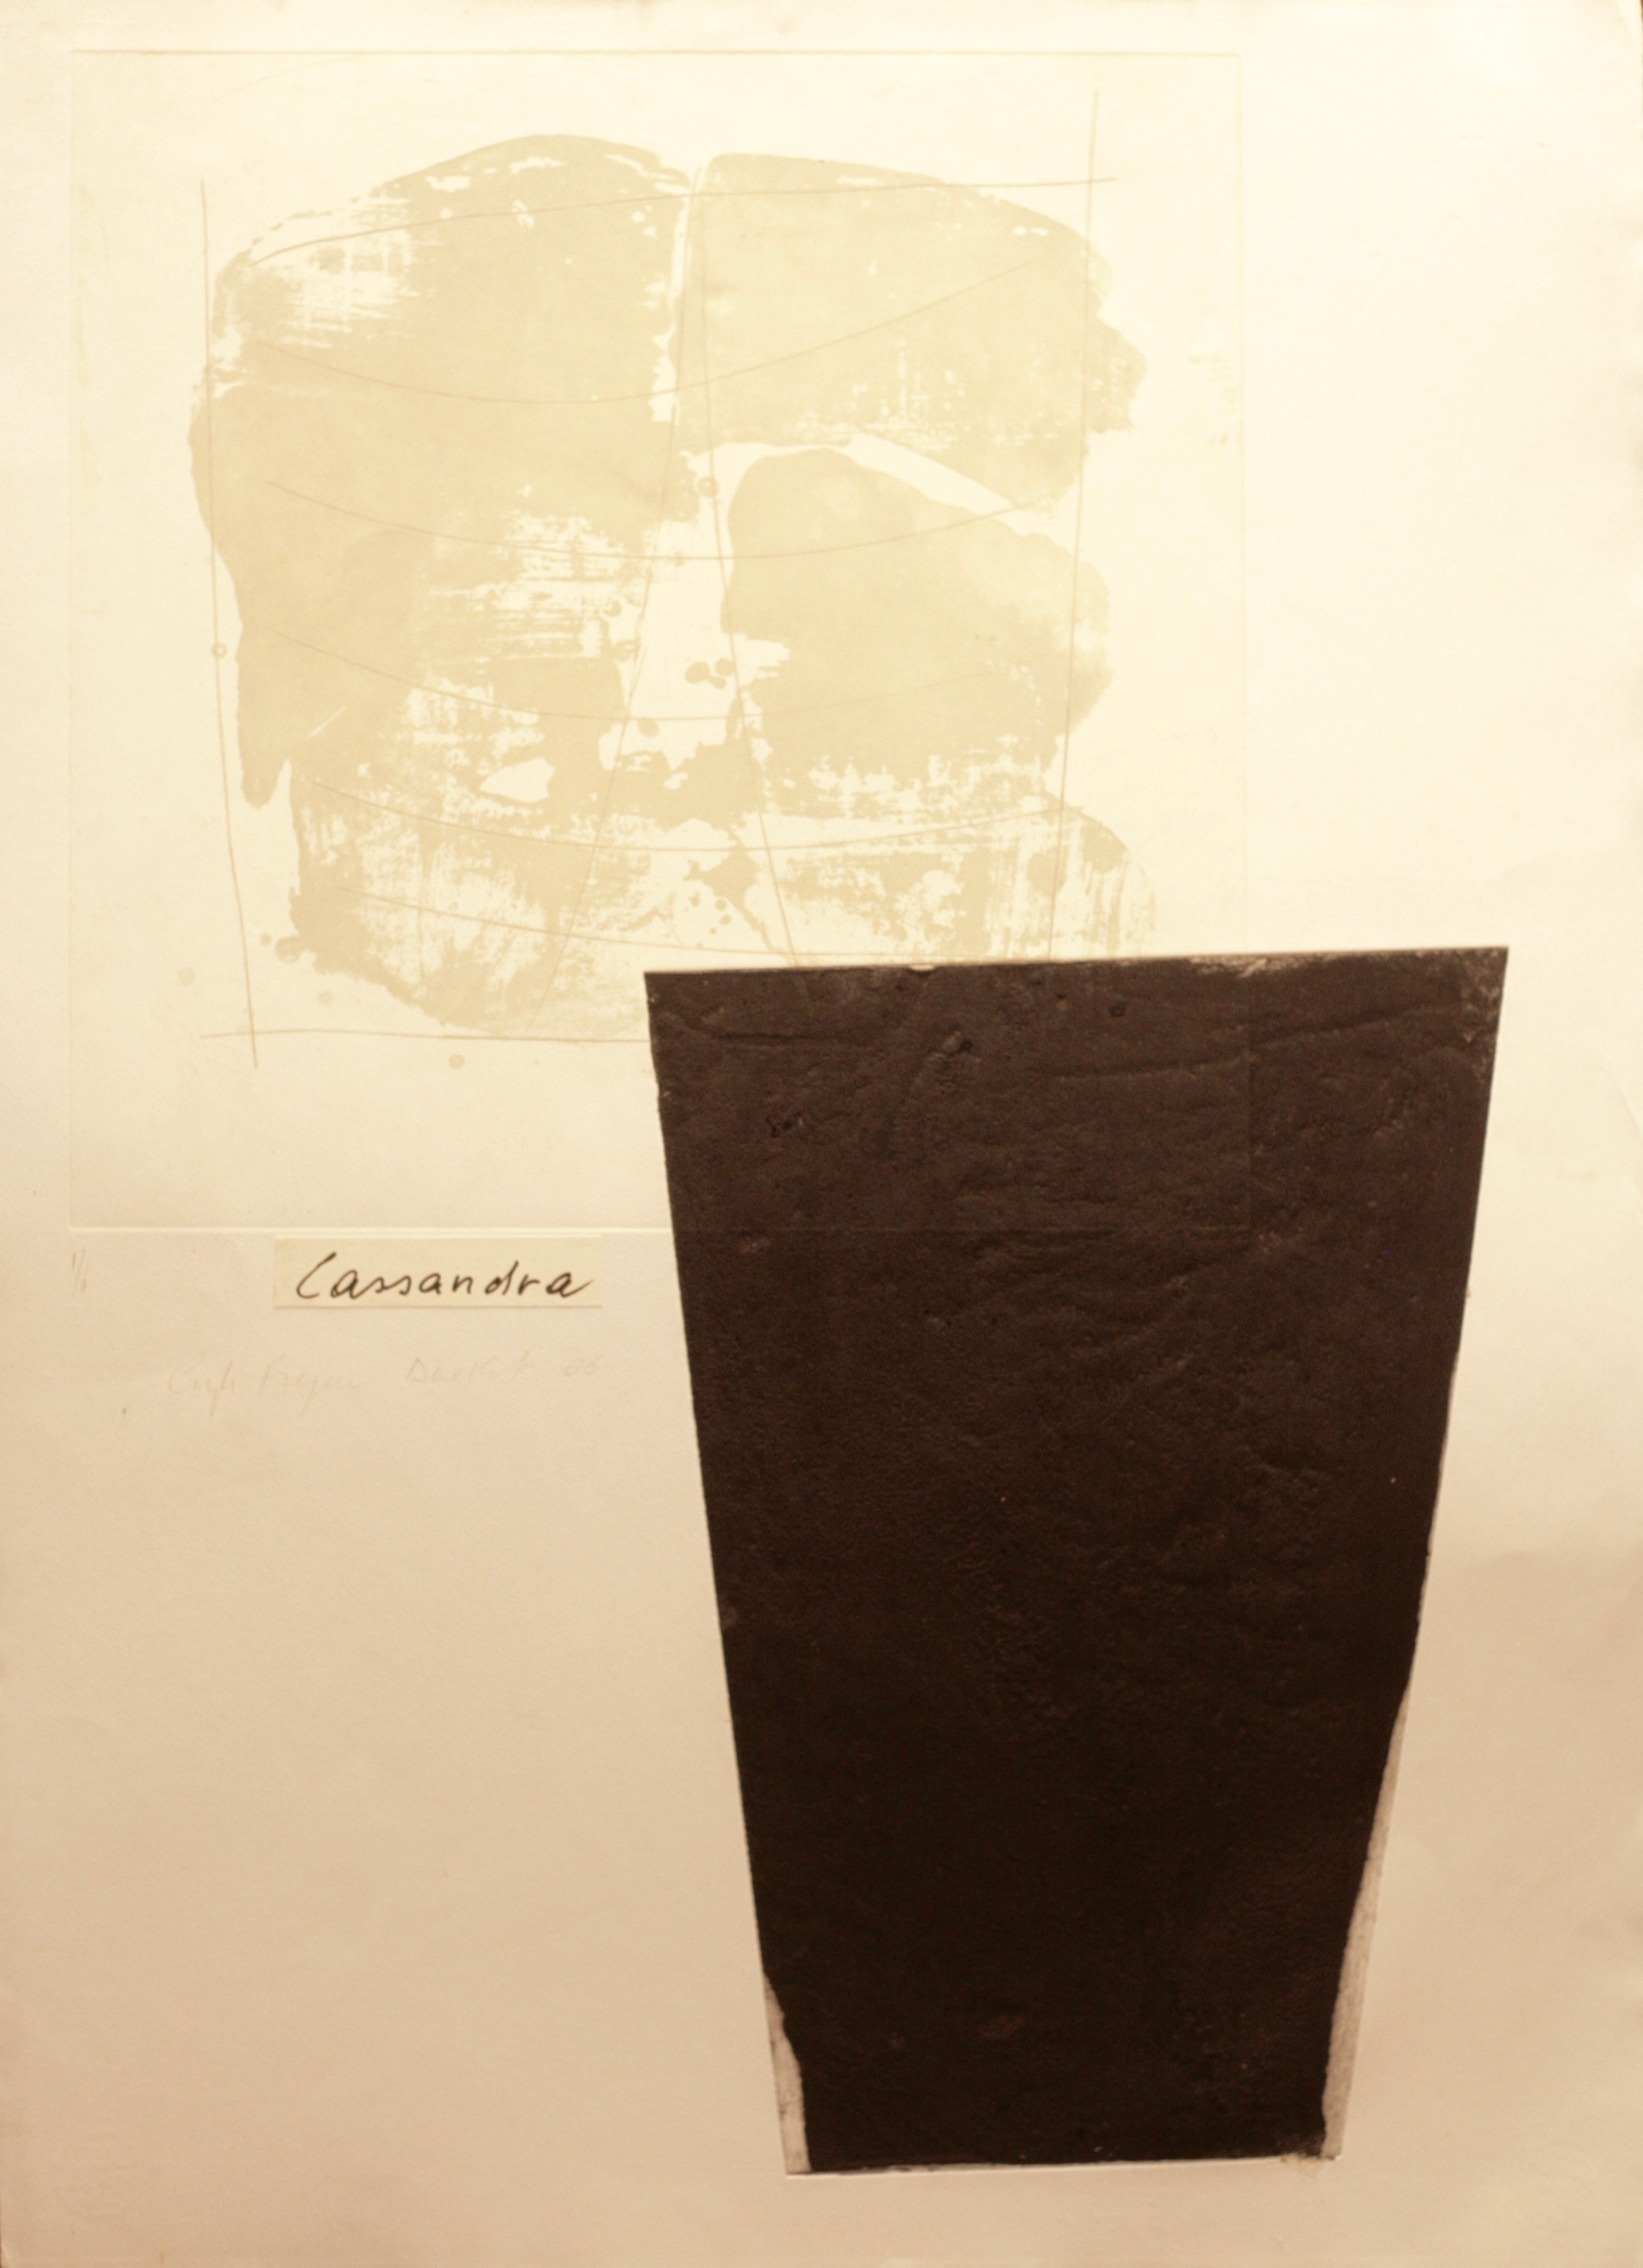 Angela Brignone Duckert - Cassandra, graphic print